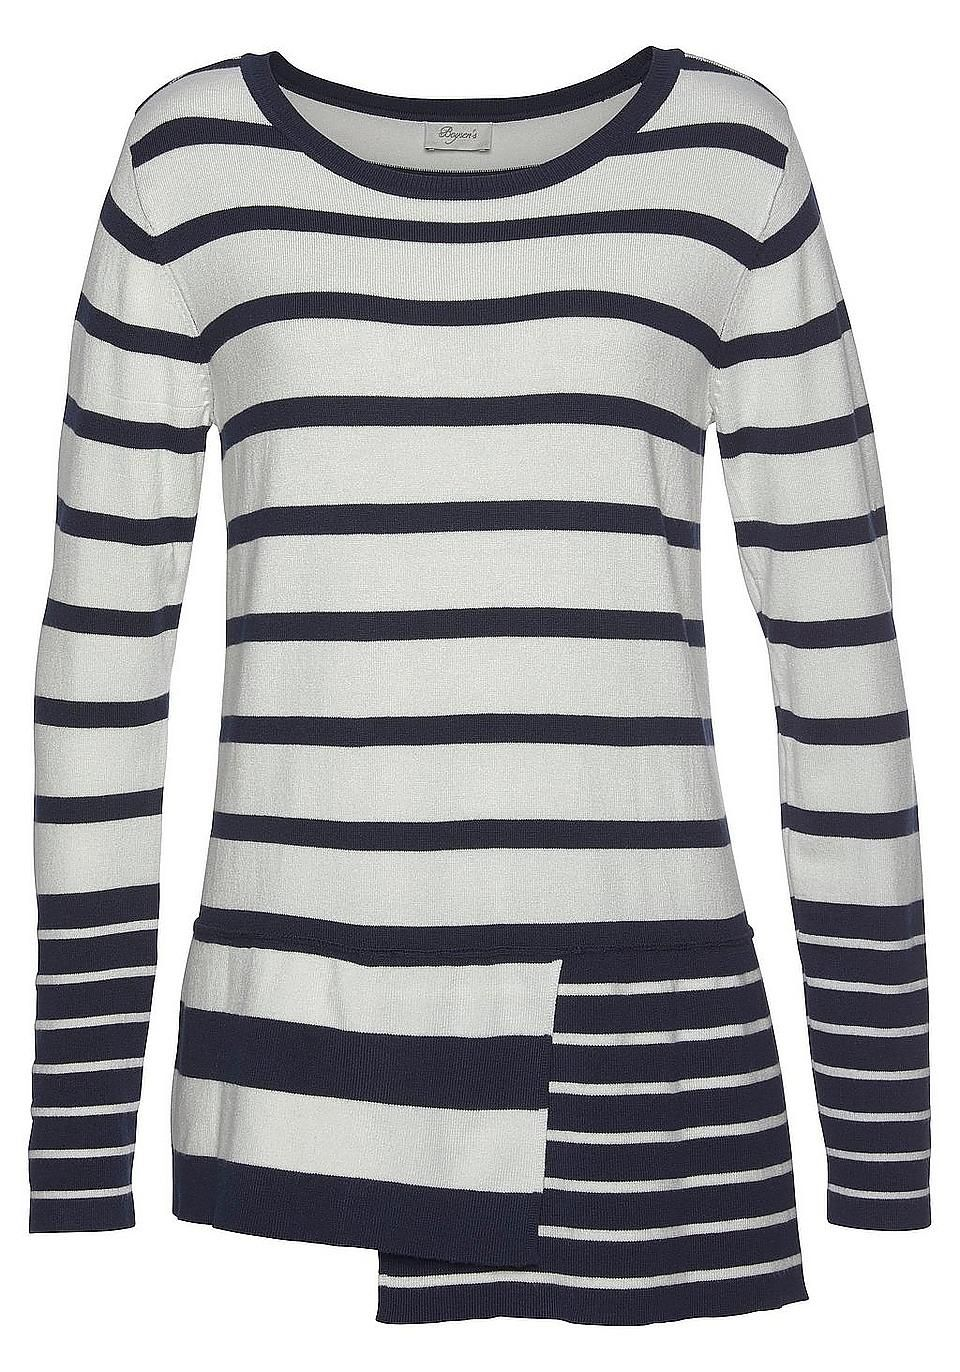 wholesale dealer 008f9 baccd Boysen's Strickpullover online | Maritime Mode | BAUR in ...